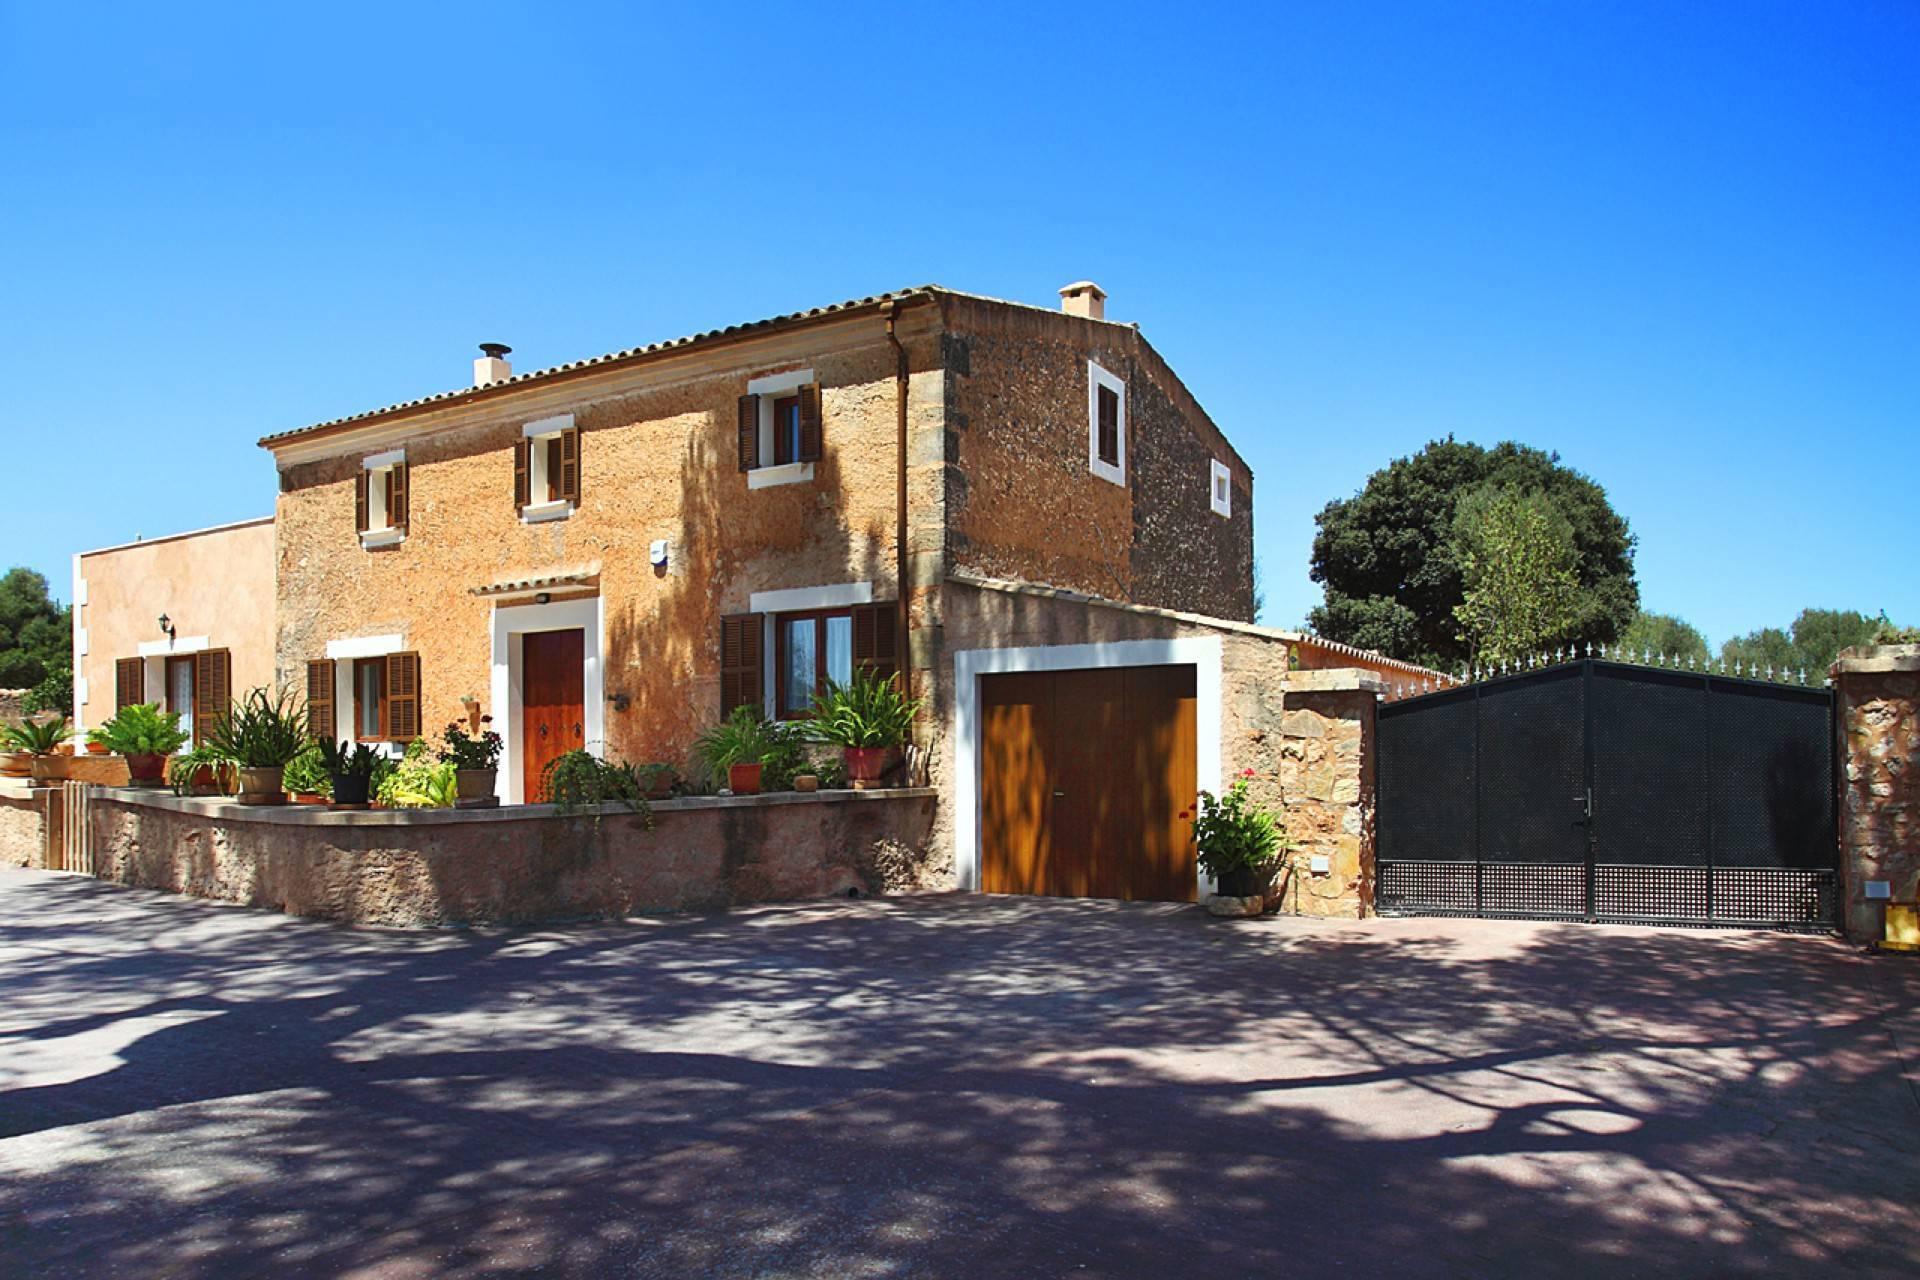 01-142 Rustic farmhouse Mallorca east Bild 7